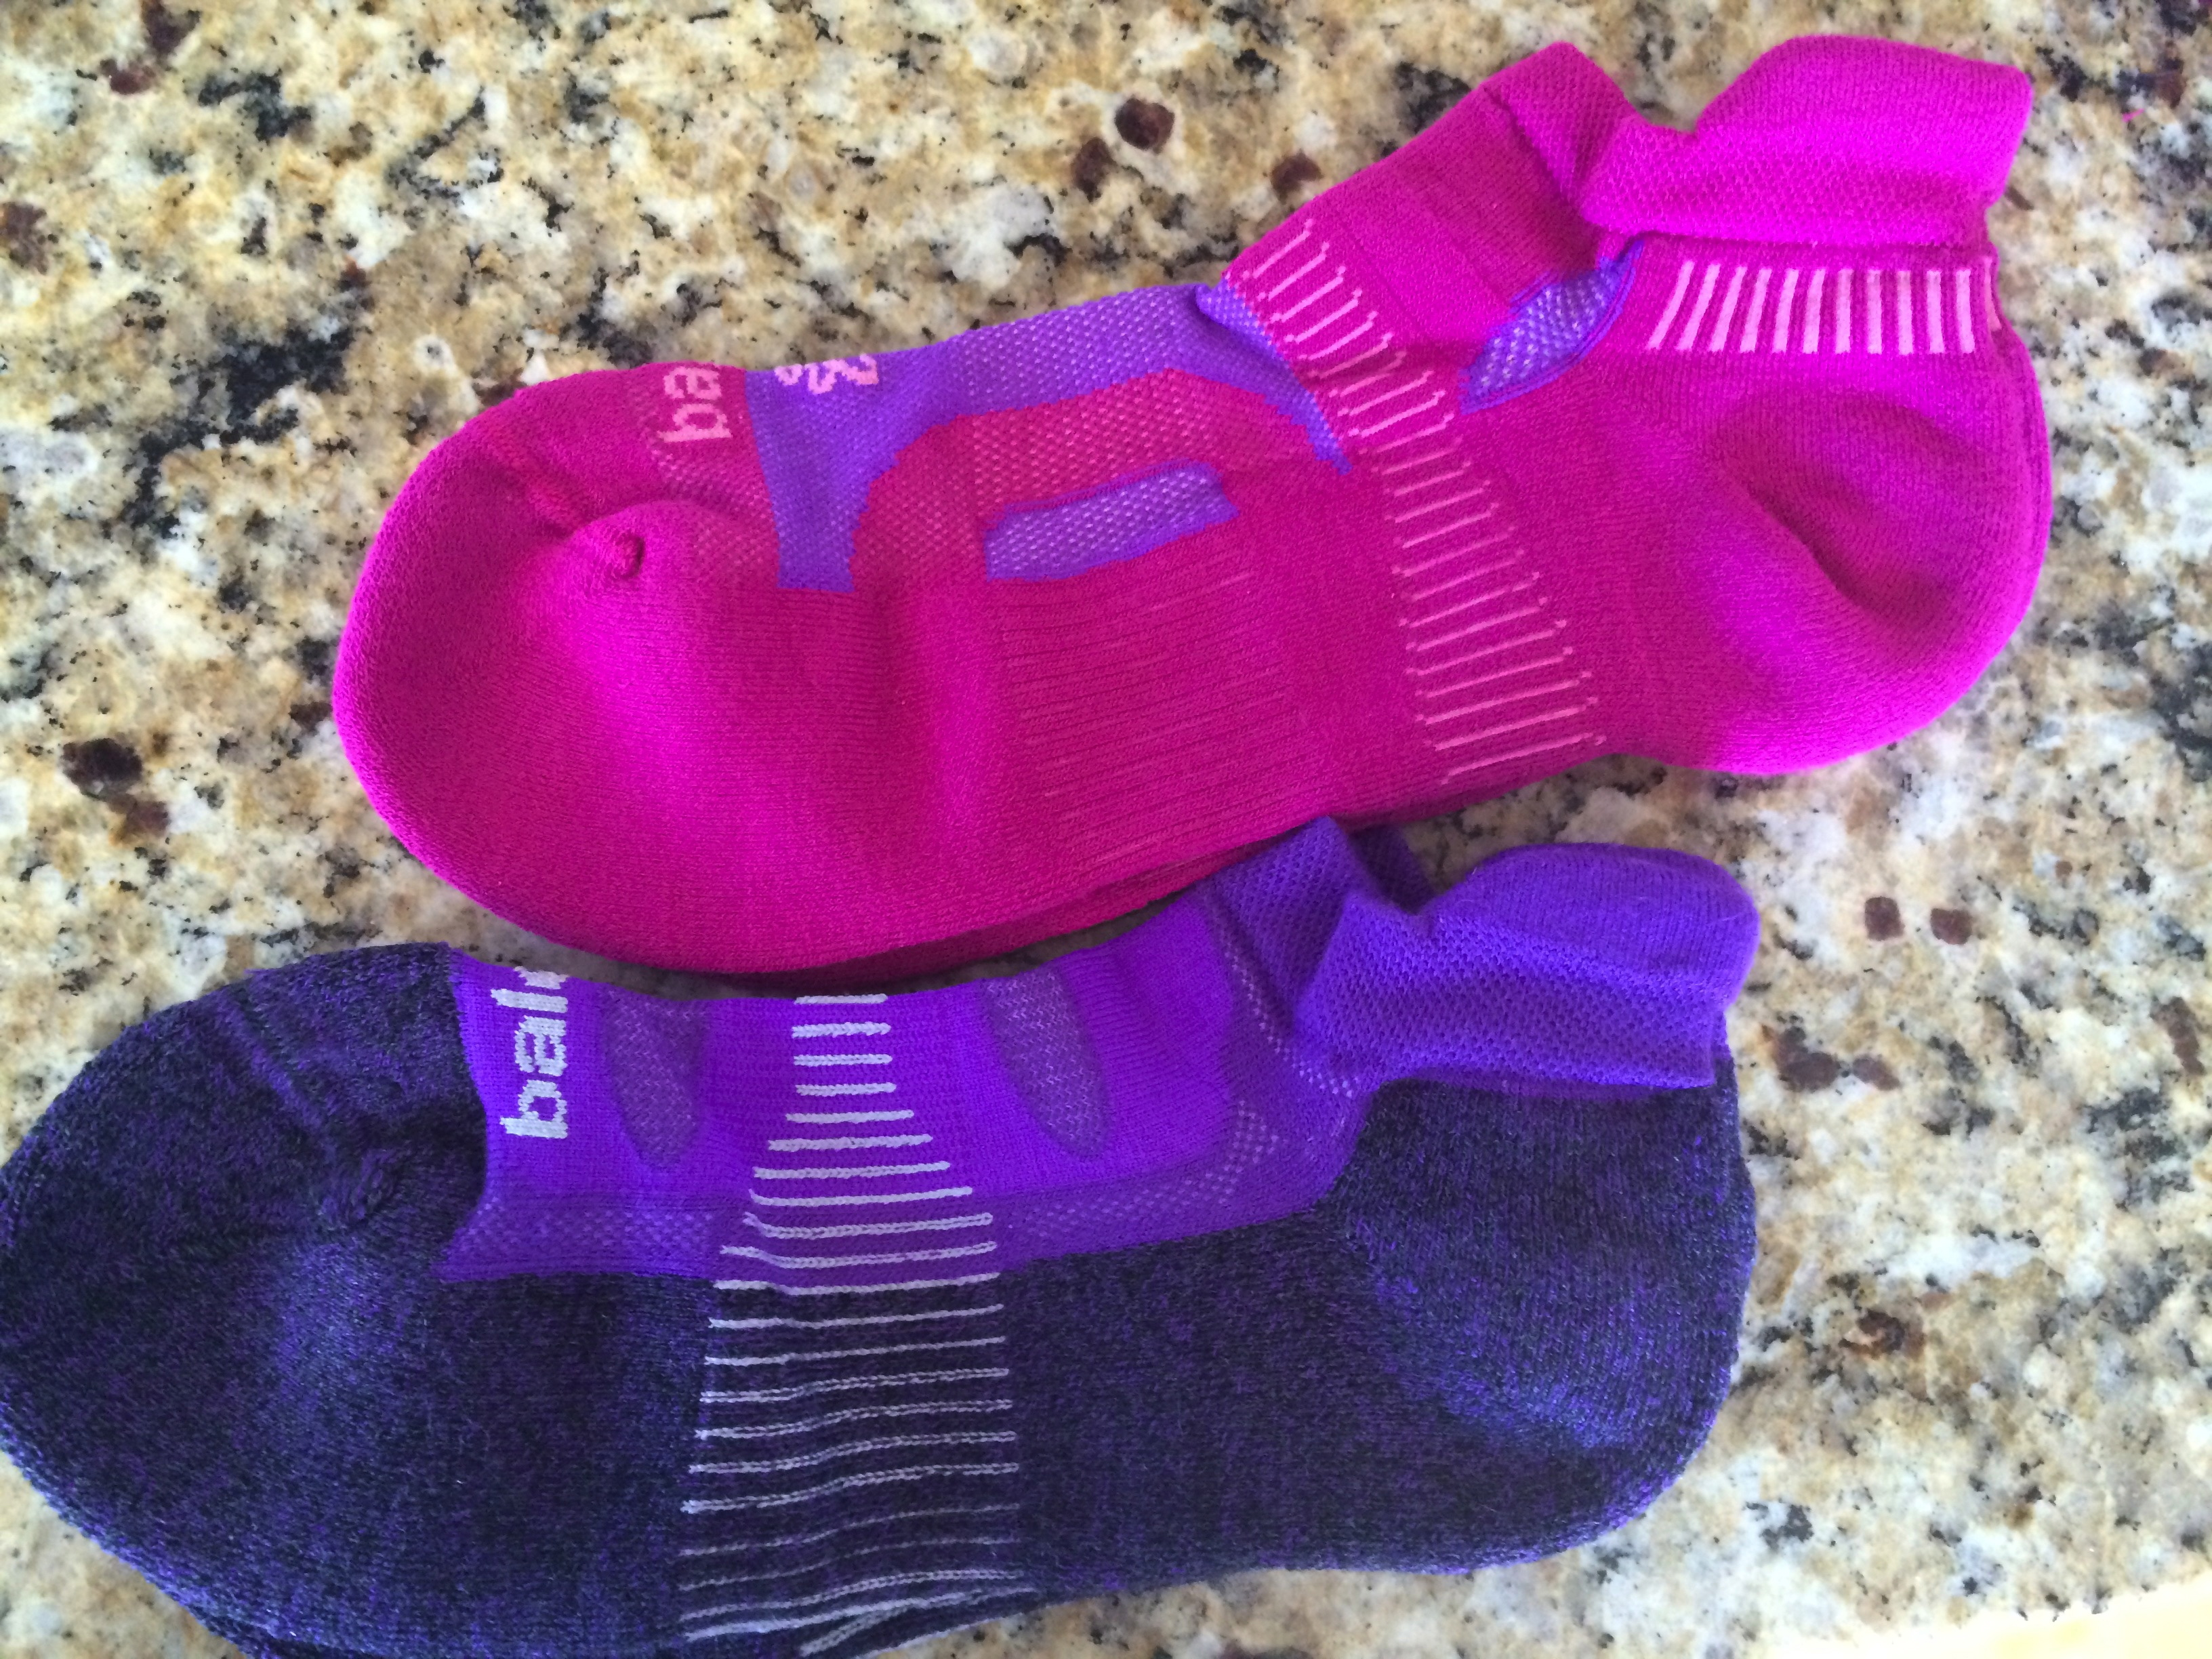 play com hidden comfort pack balega boy school lightfeet boys sports mini comforter sport socksforliving kids collections crew s socks